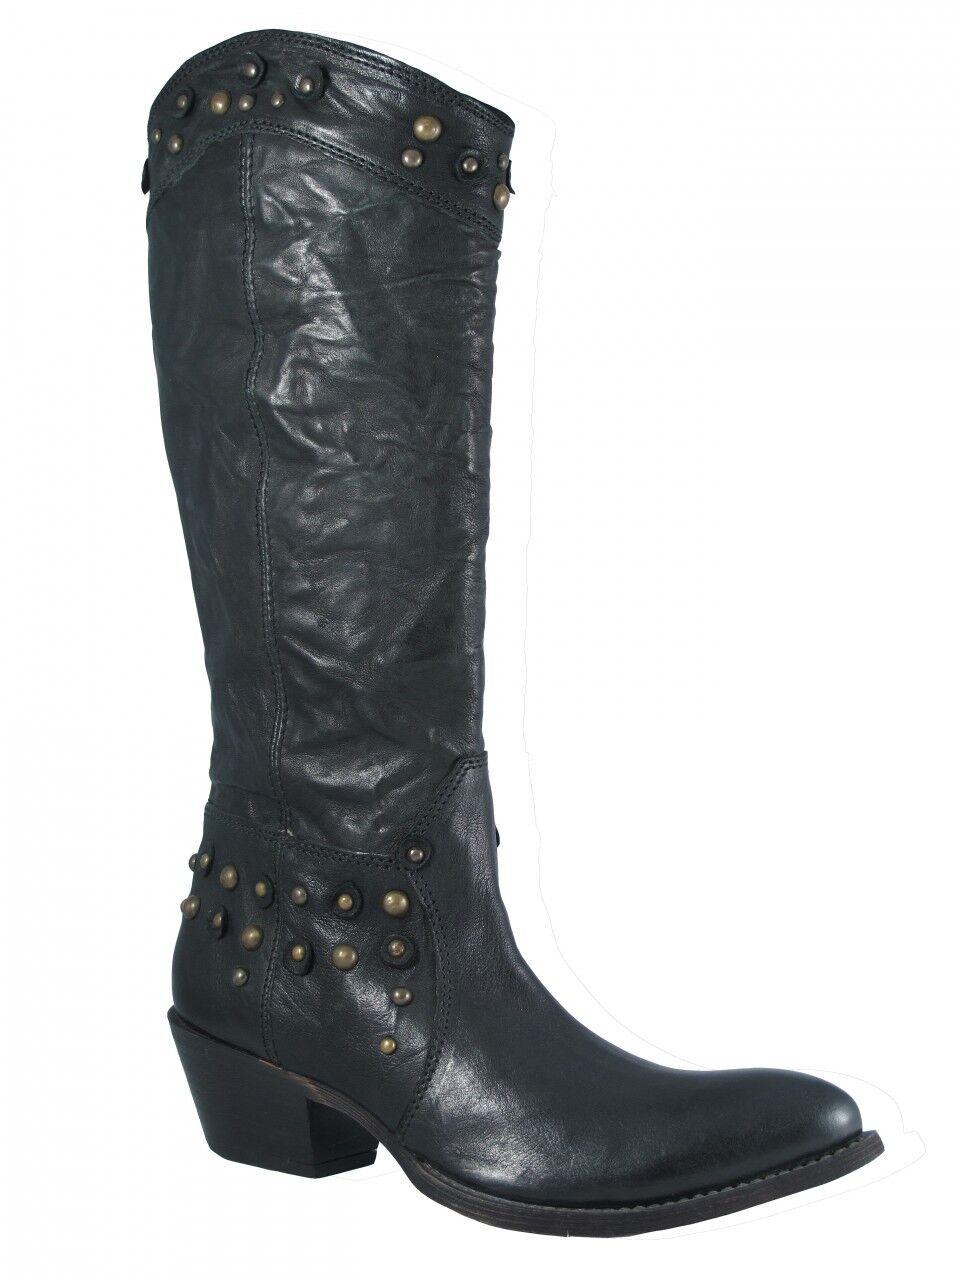 Women's The Seller Italian Western 3023 Boot, Black